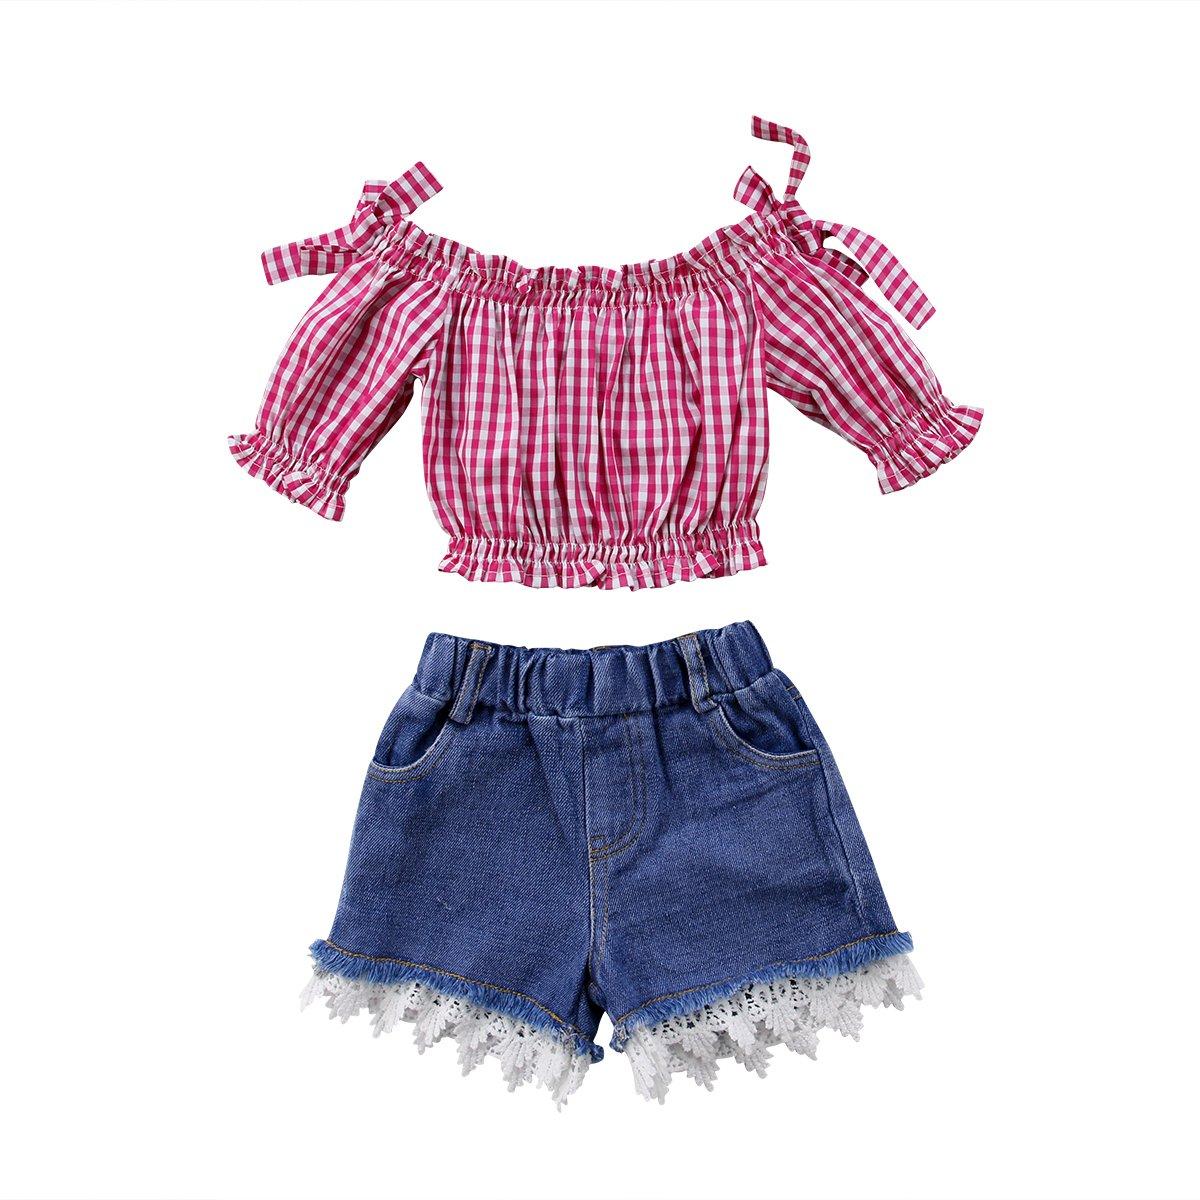 Aliven 2Pcs Set Summer Toddler Kids Girls Plaids Off Shoulder Tops T-Shirt + Lace Denim Shorts Outfits Clothes